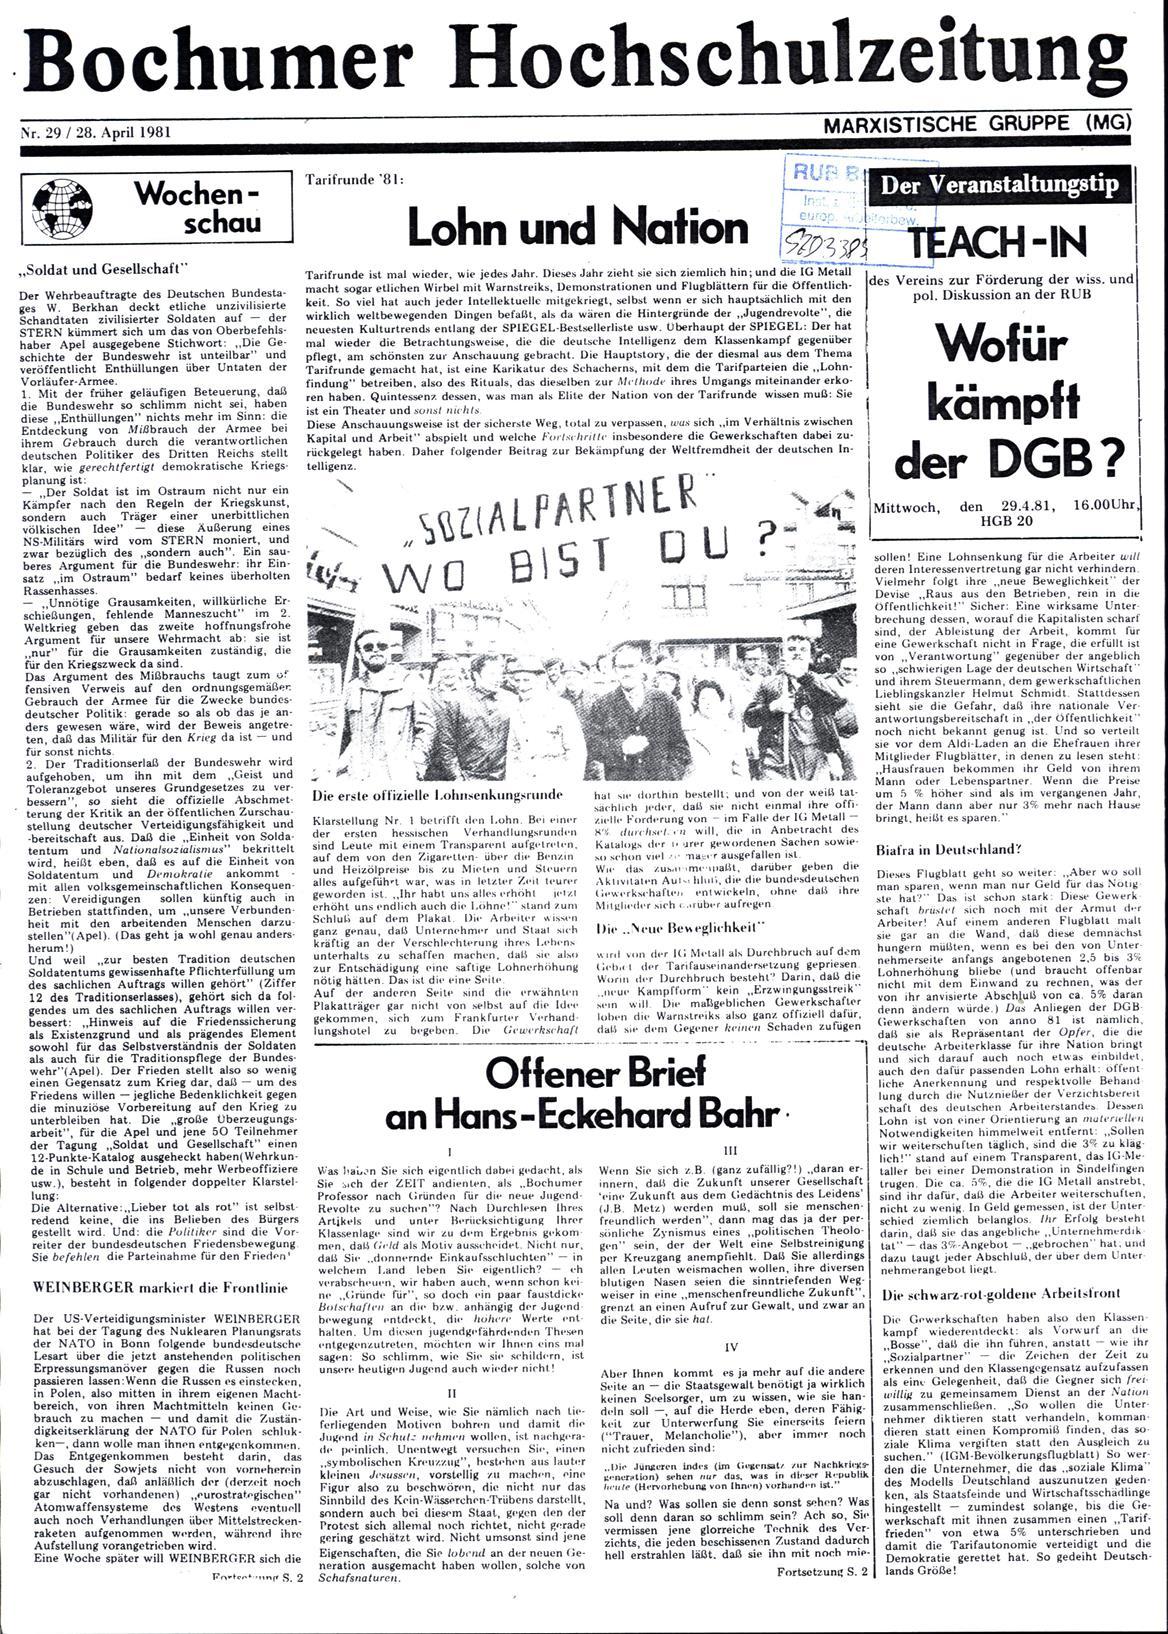 Bochum_BHZ_19810428_029_001